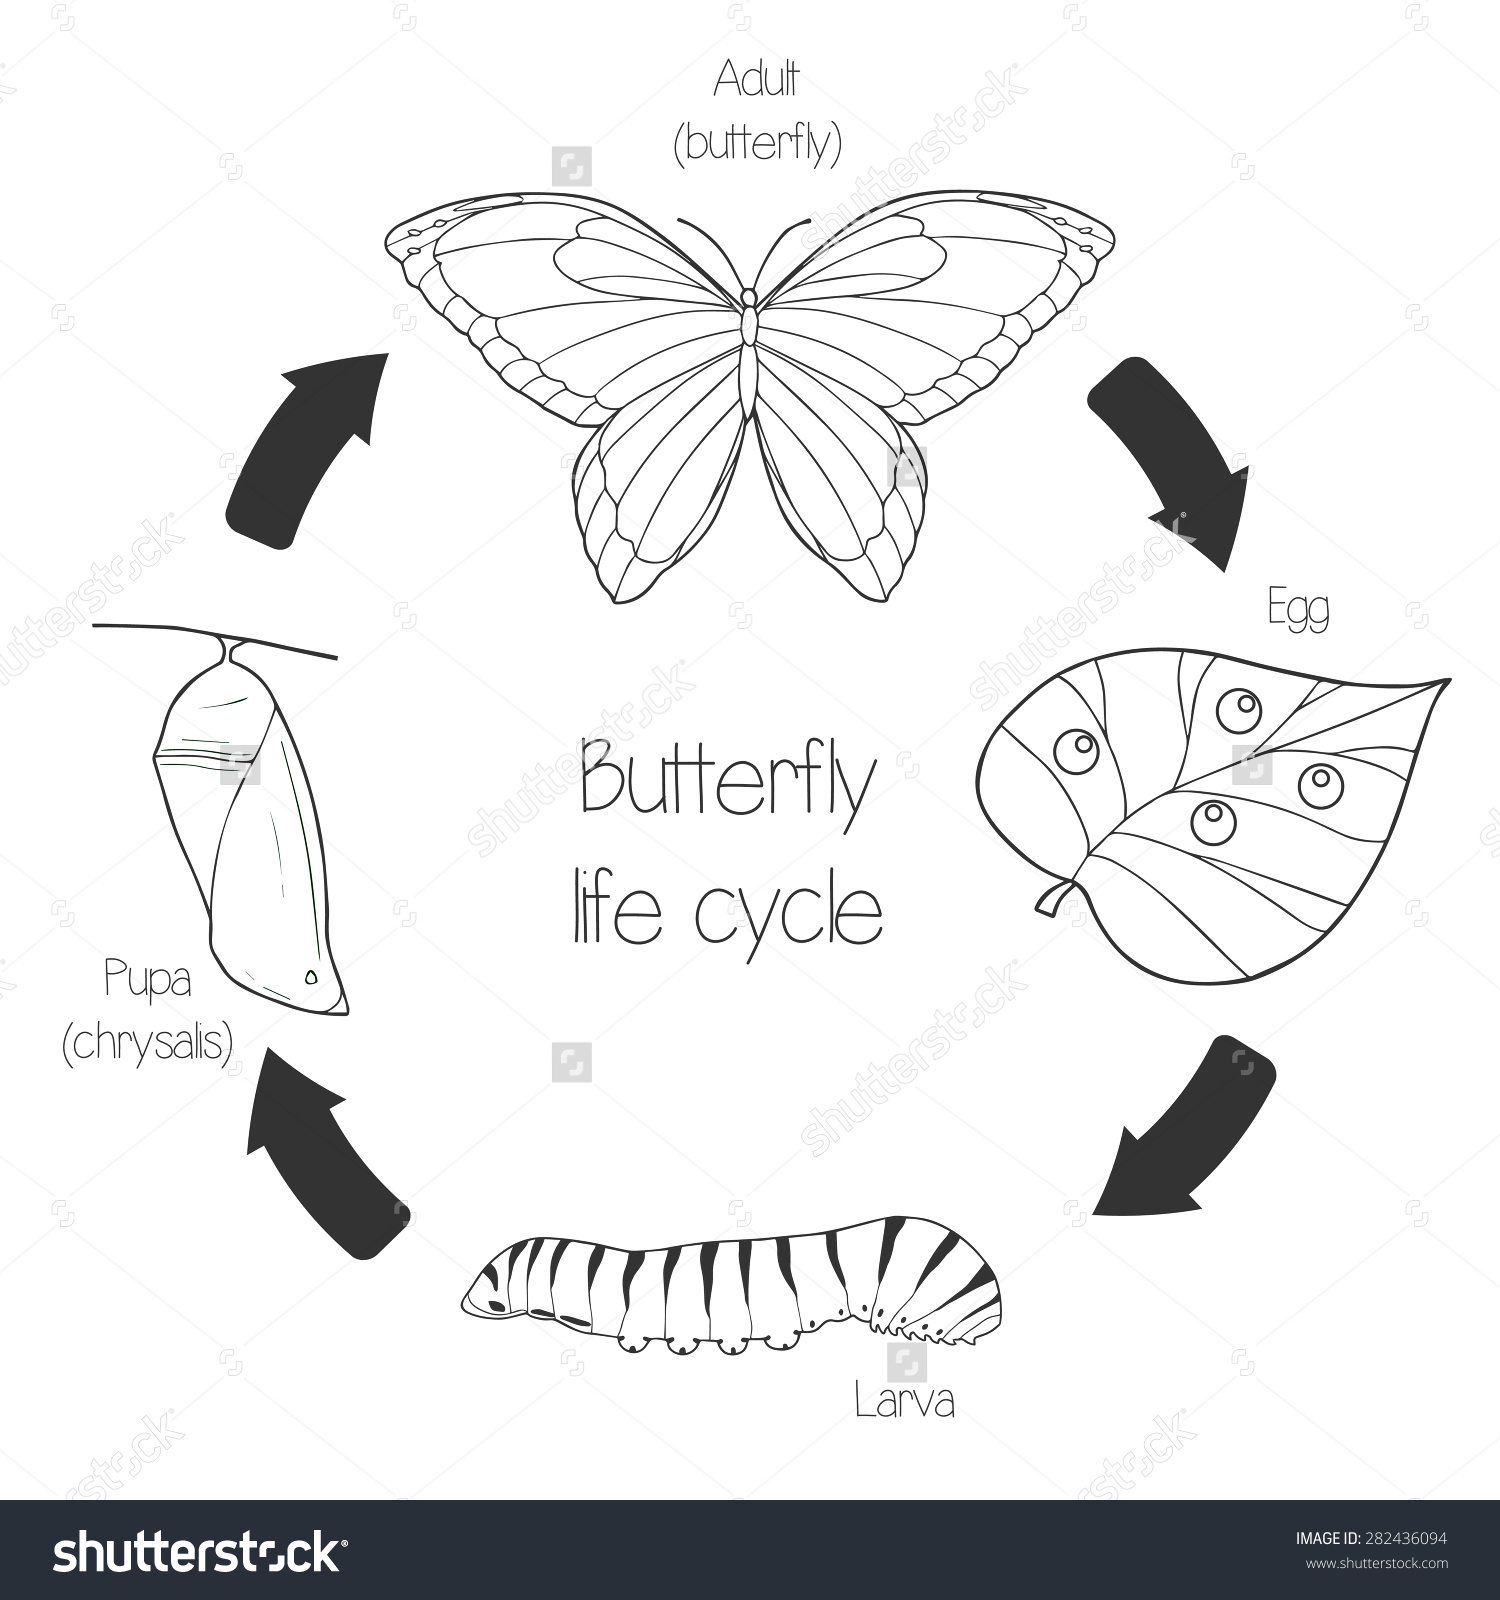 Silk Moth clipart #19, Download drawings